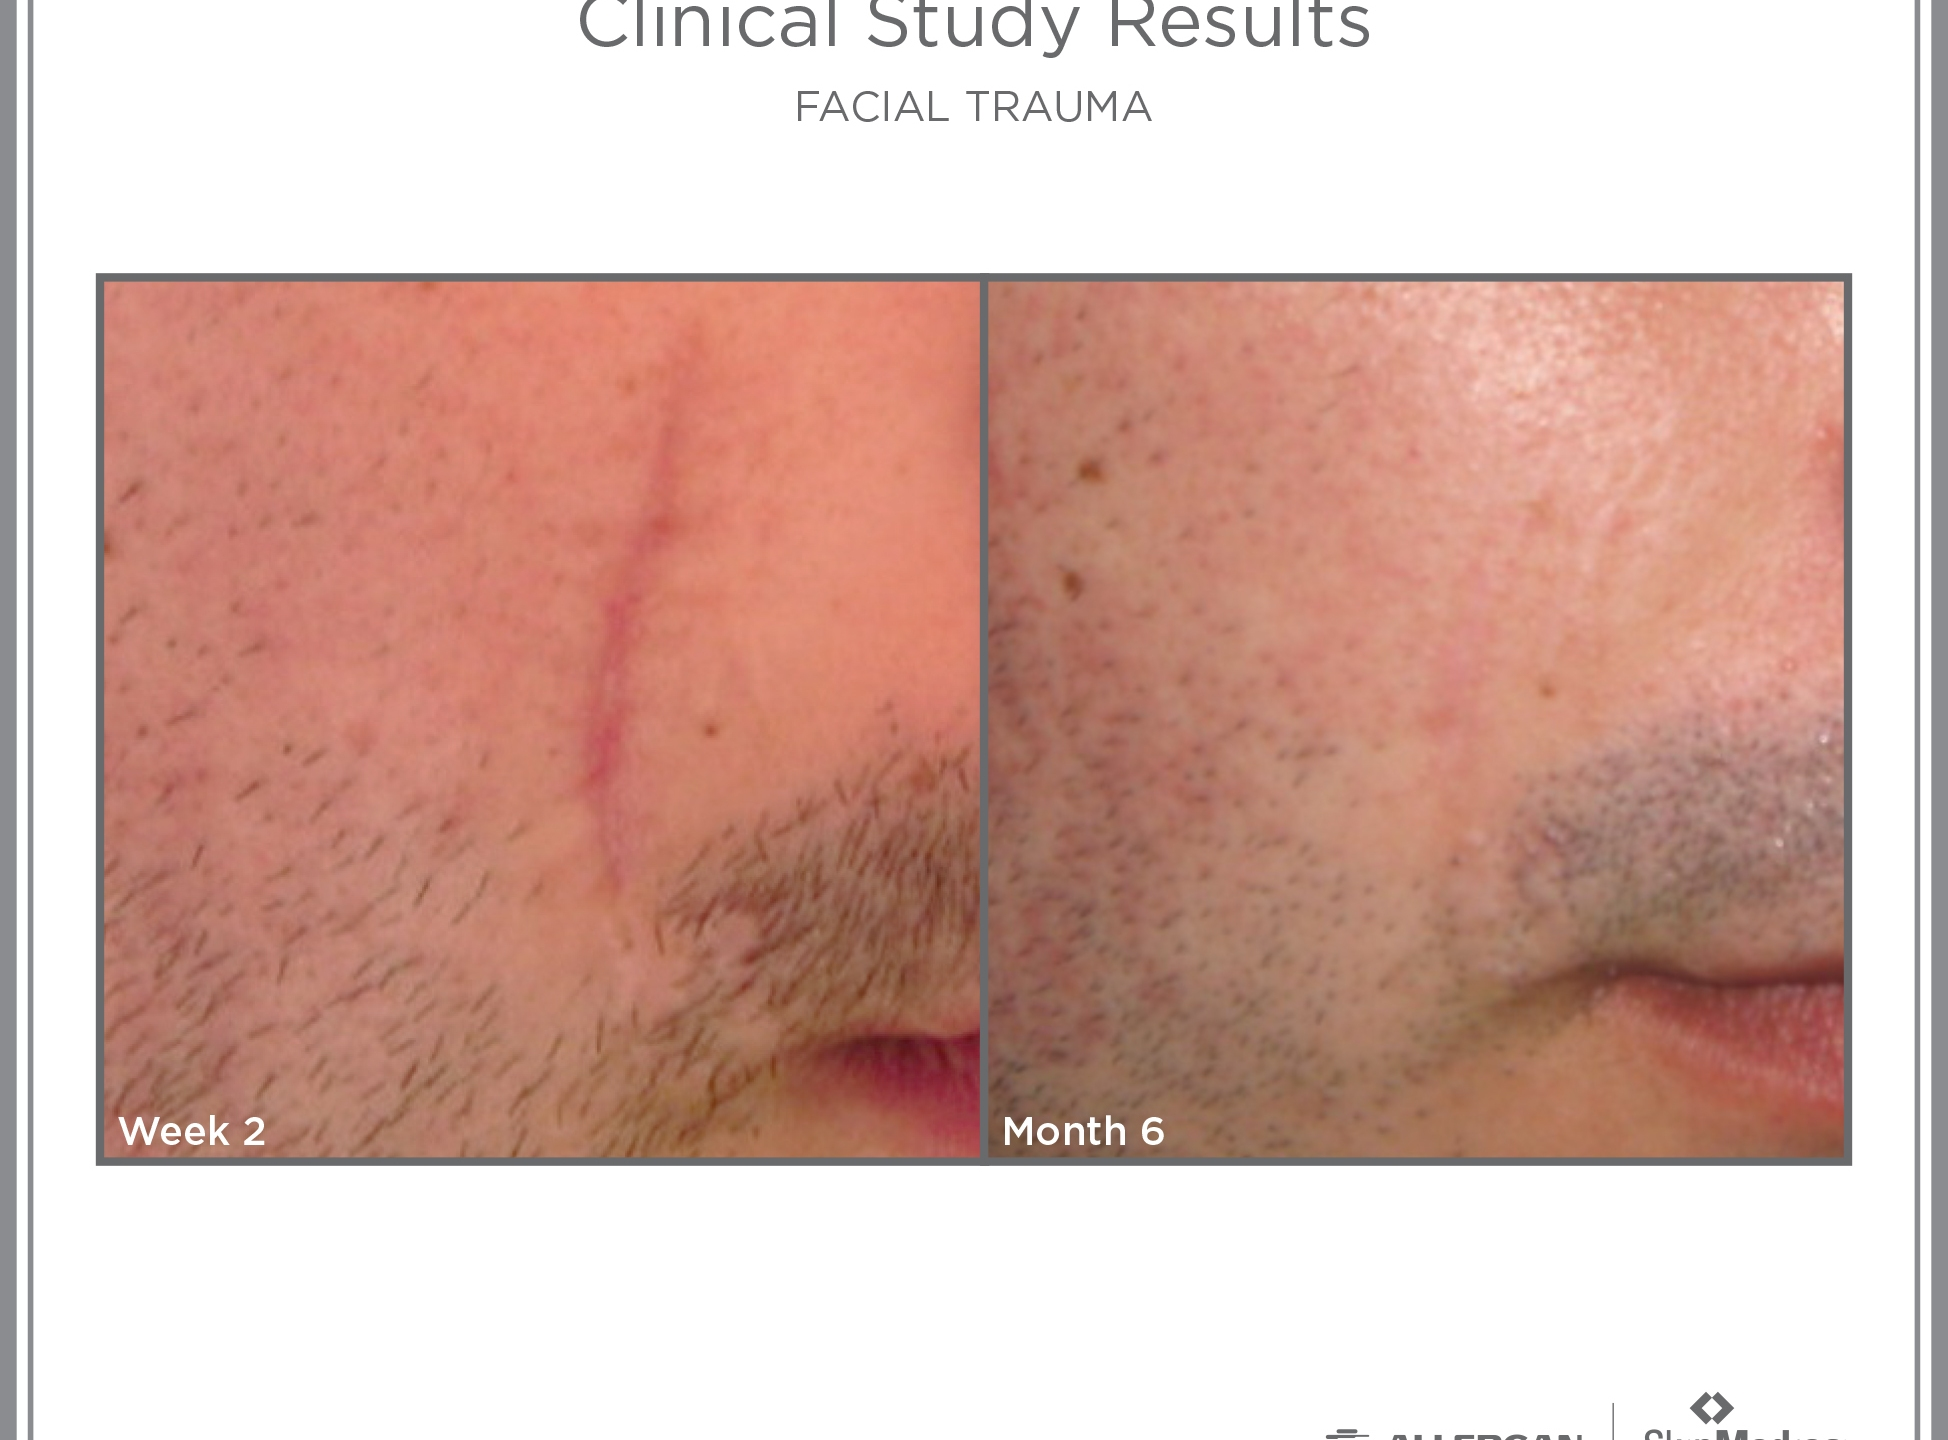 Scar Recovery Male_FacialTrauma_1513288722797.jpg